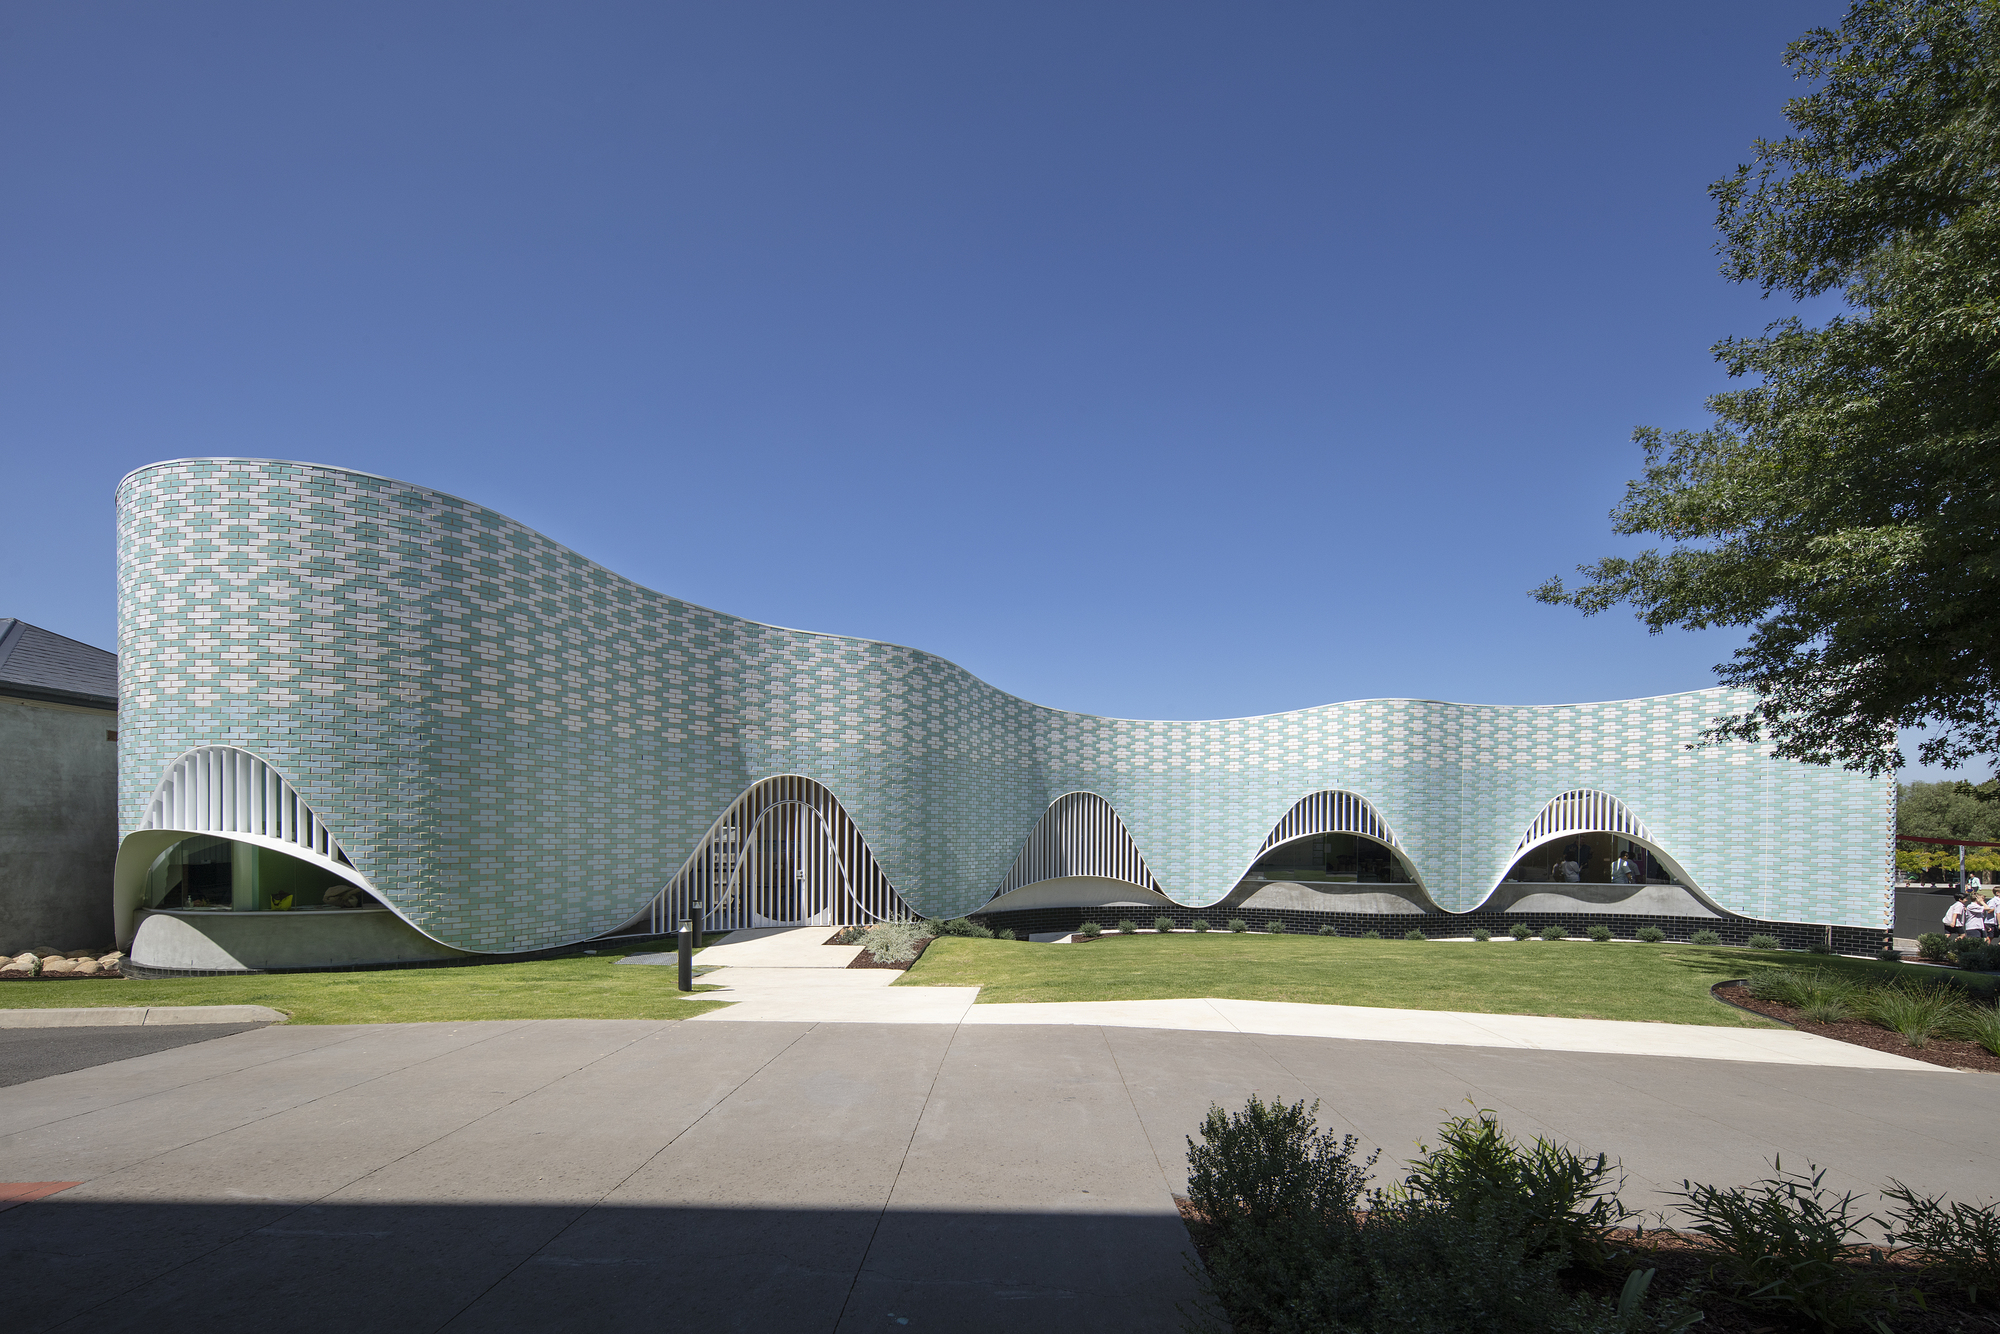 Penleigh and Essendon Grammar School Music Centre / McBride Charles Ryan